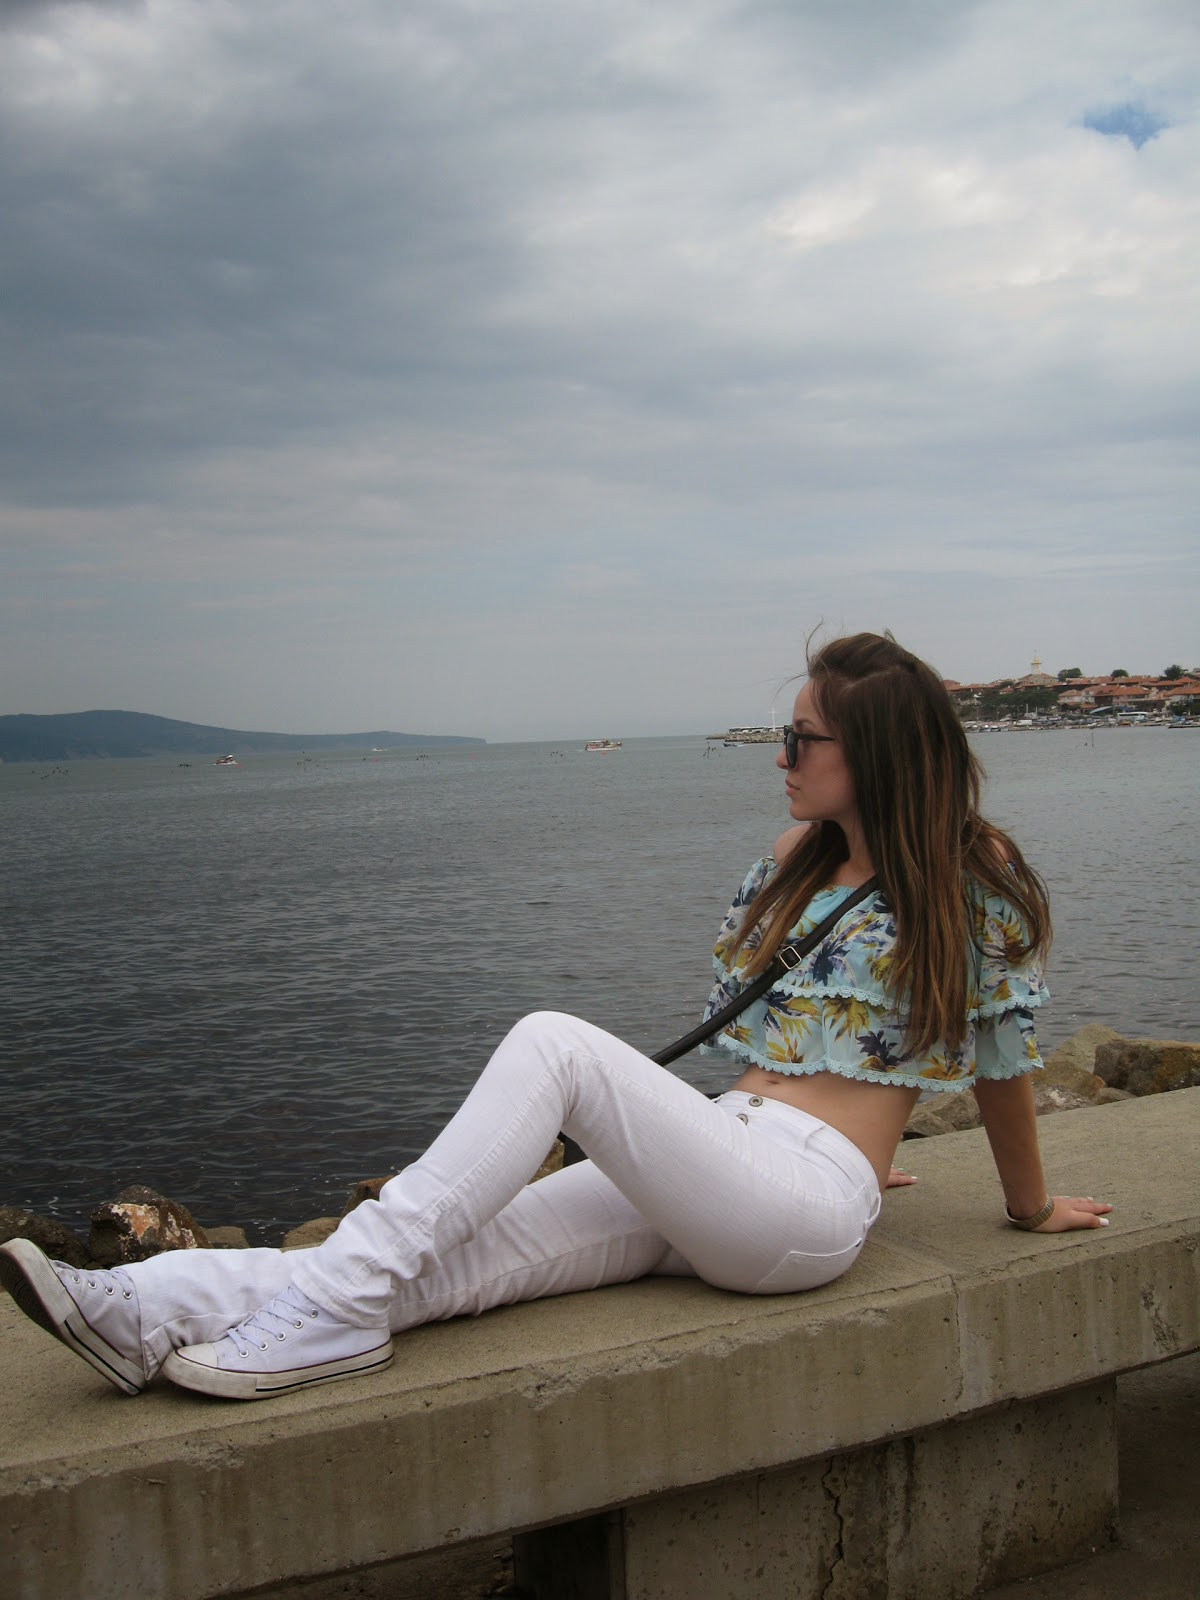 bulgaria vacation 2014, sunny beach bulgaria, nessebar bulgaria, burgas bulgaria, summer vacation